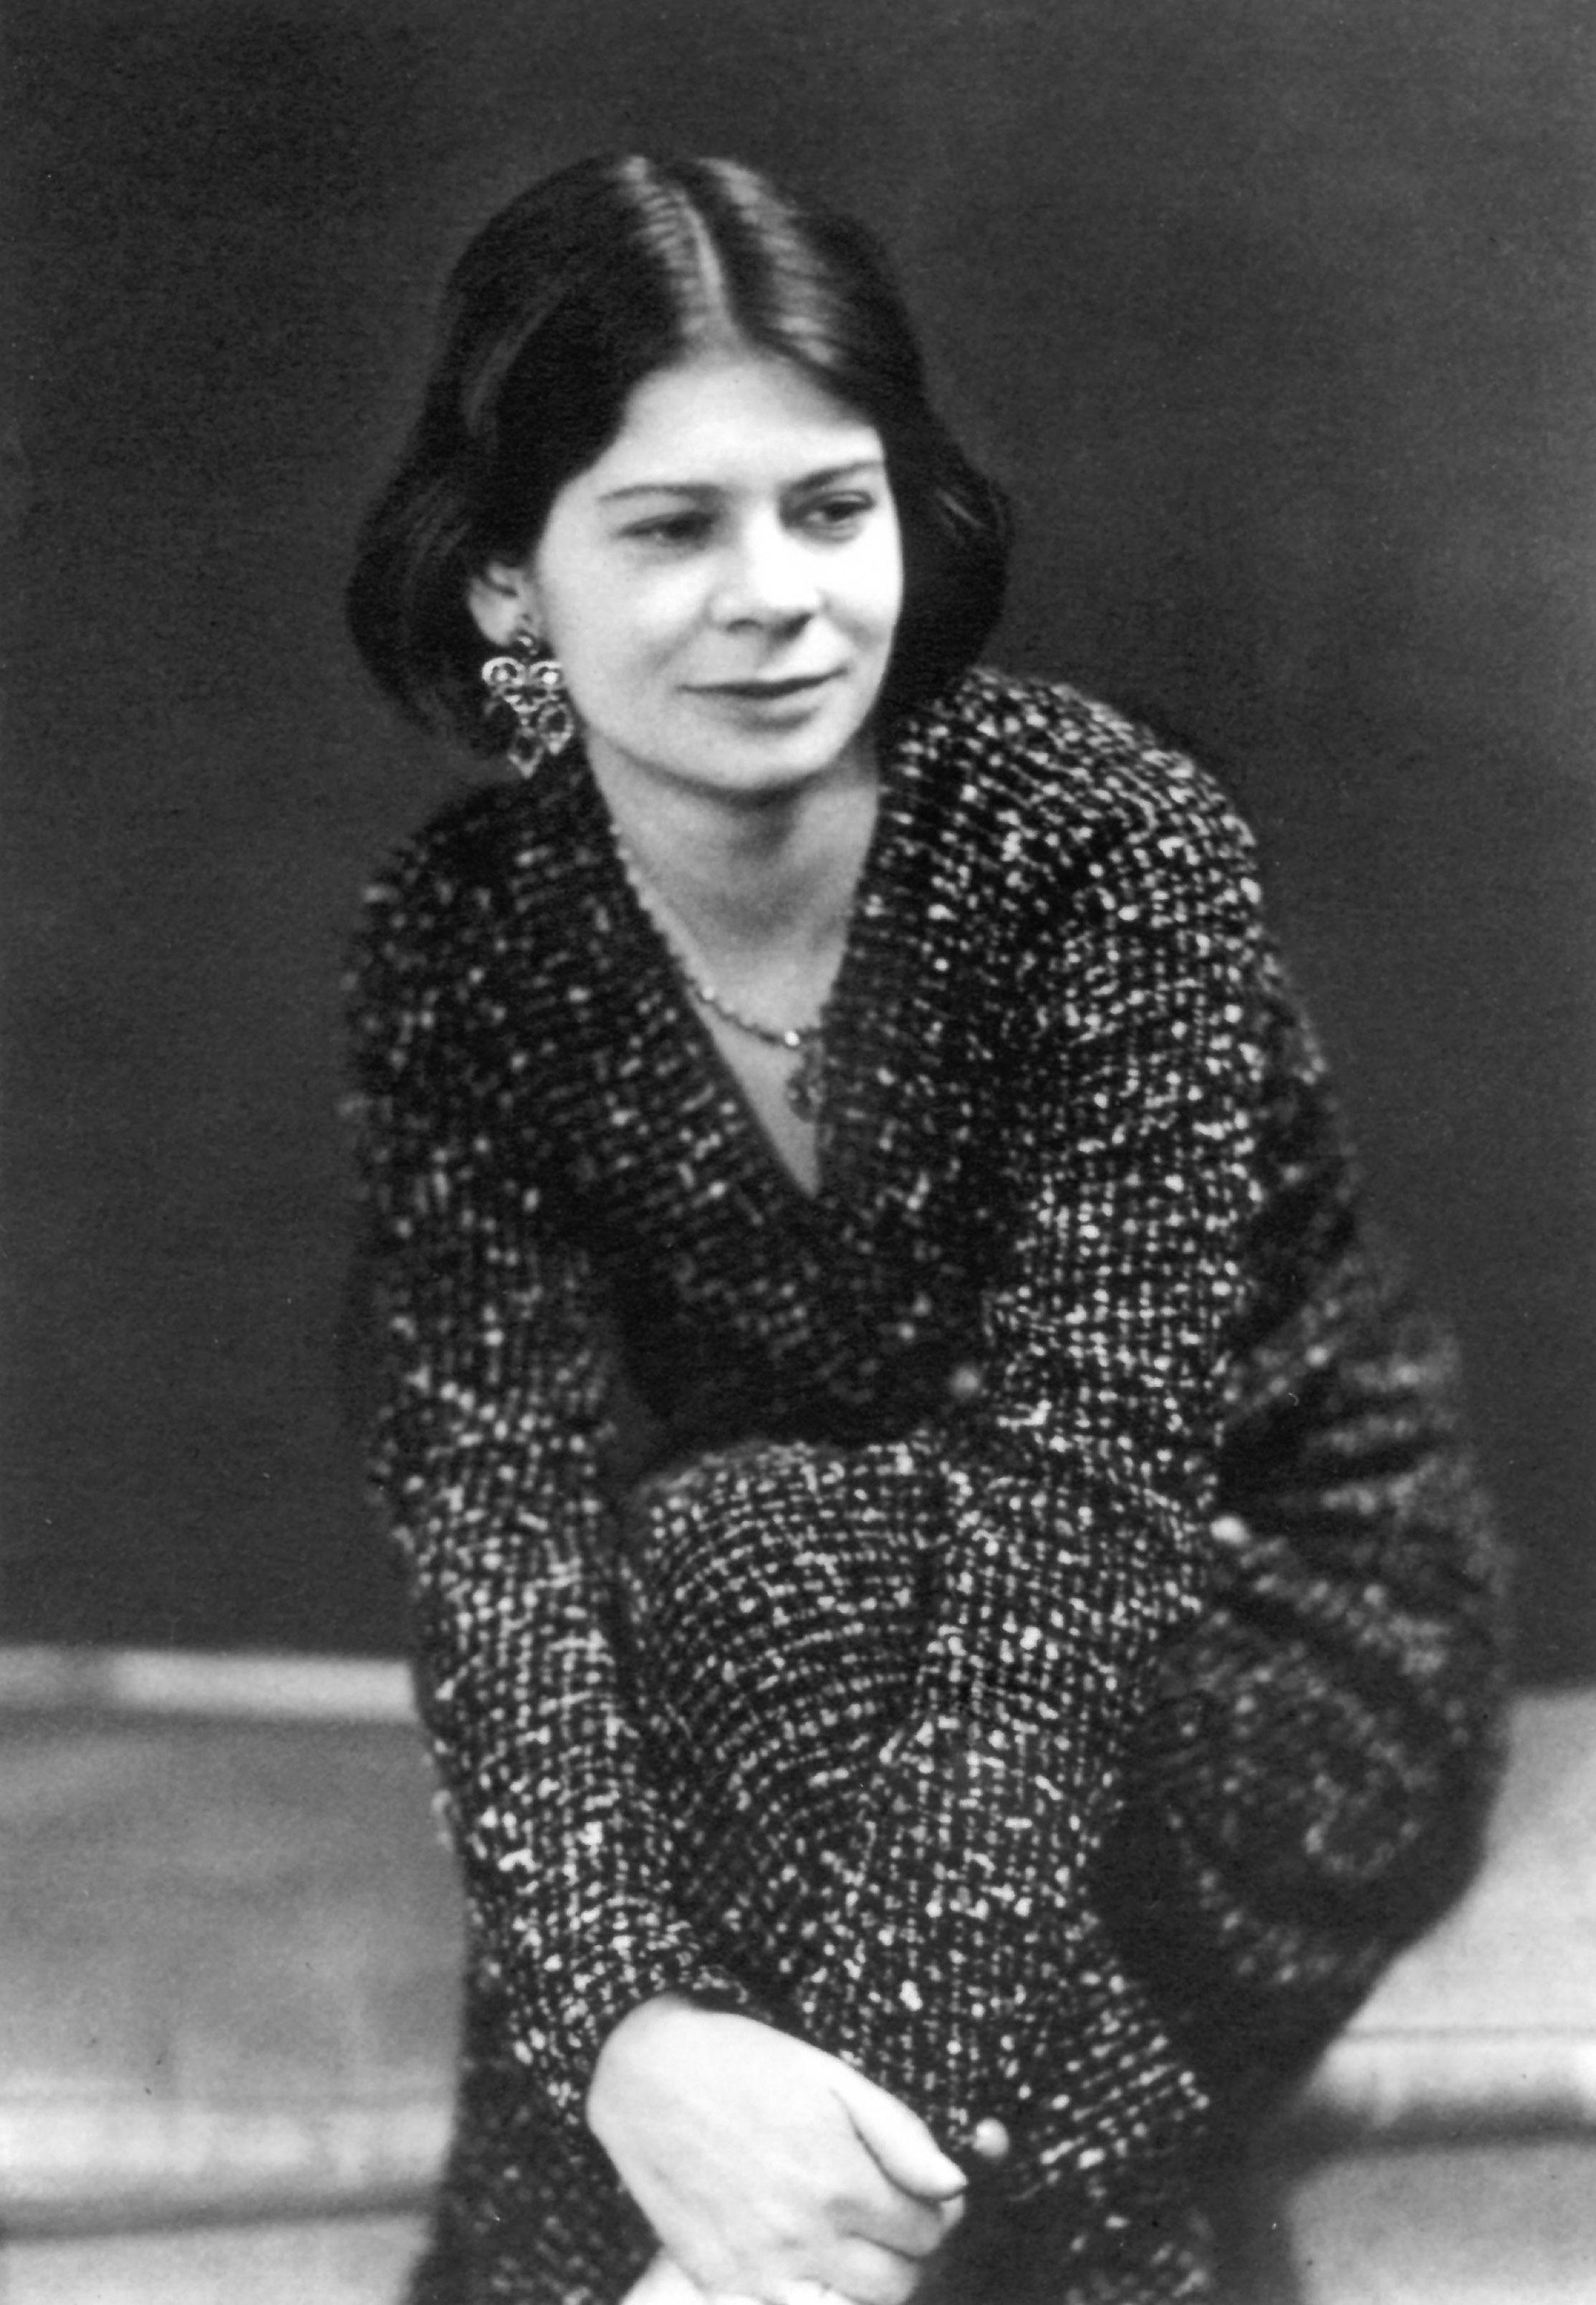 Margaret Gardiner c. 1932